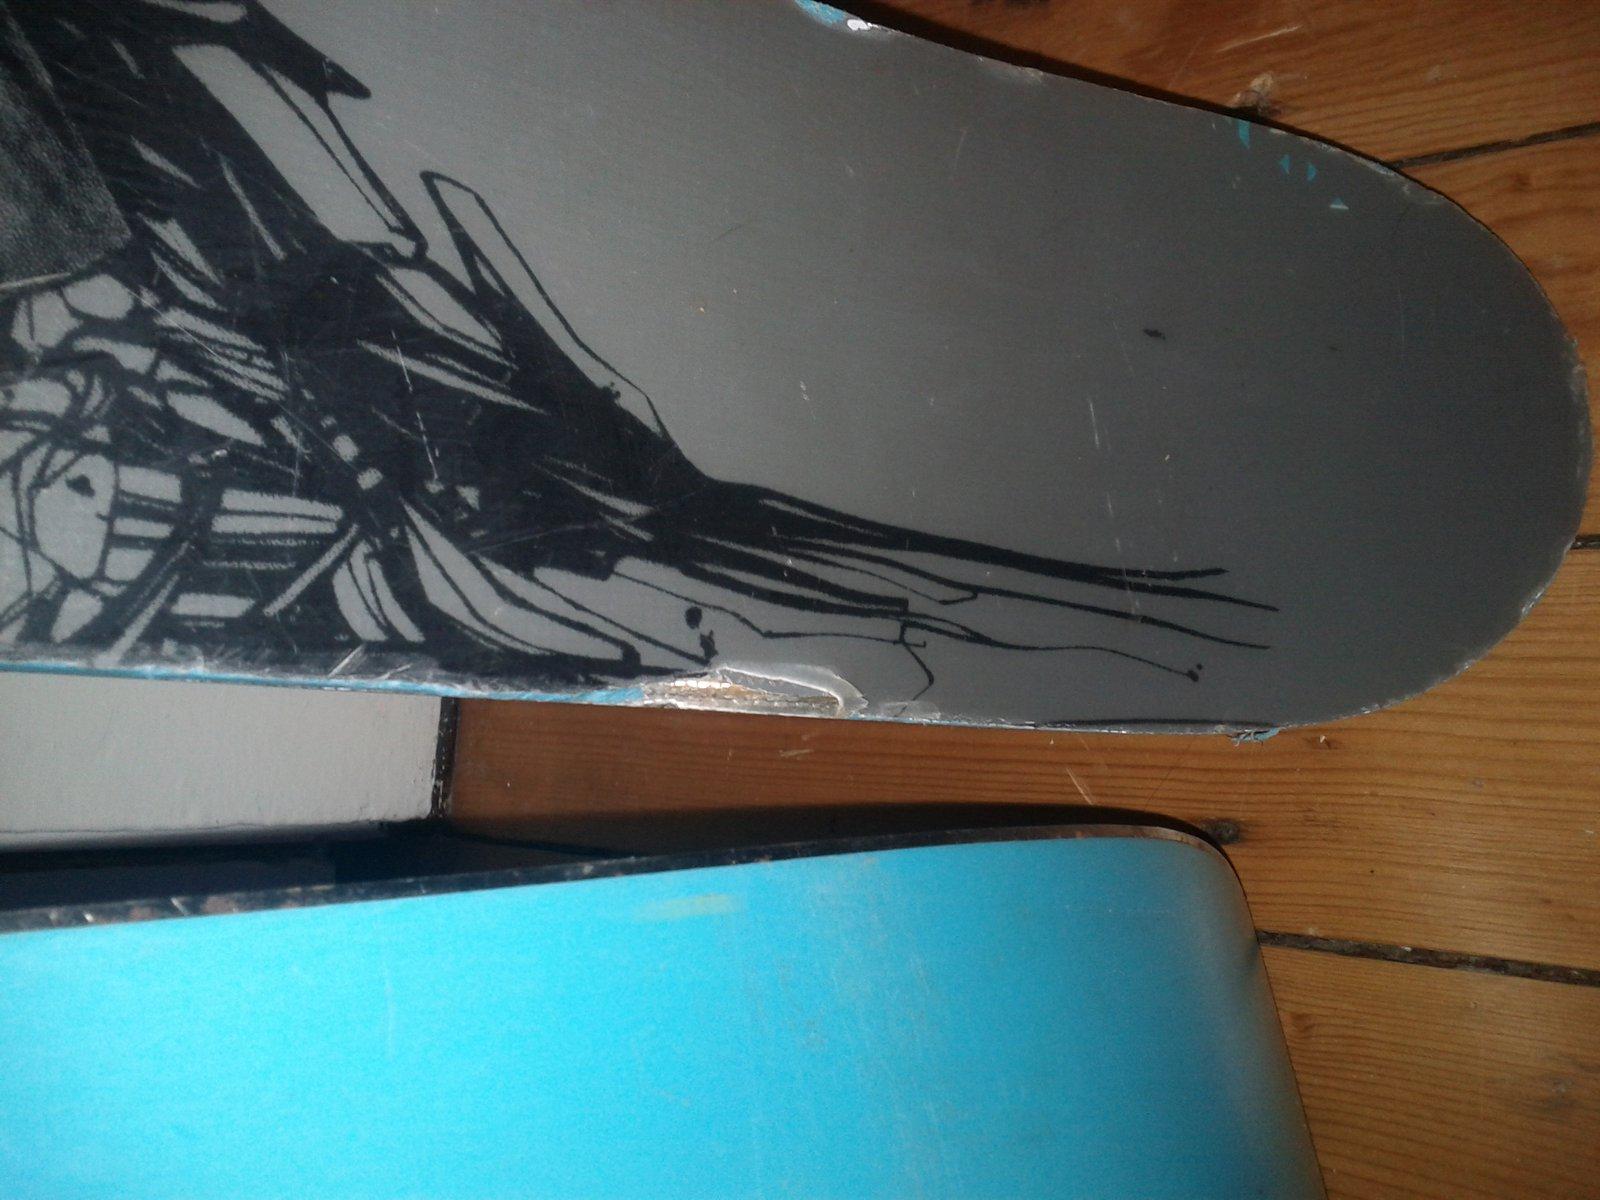 chronics top sheet damage